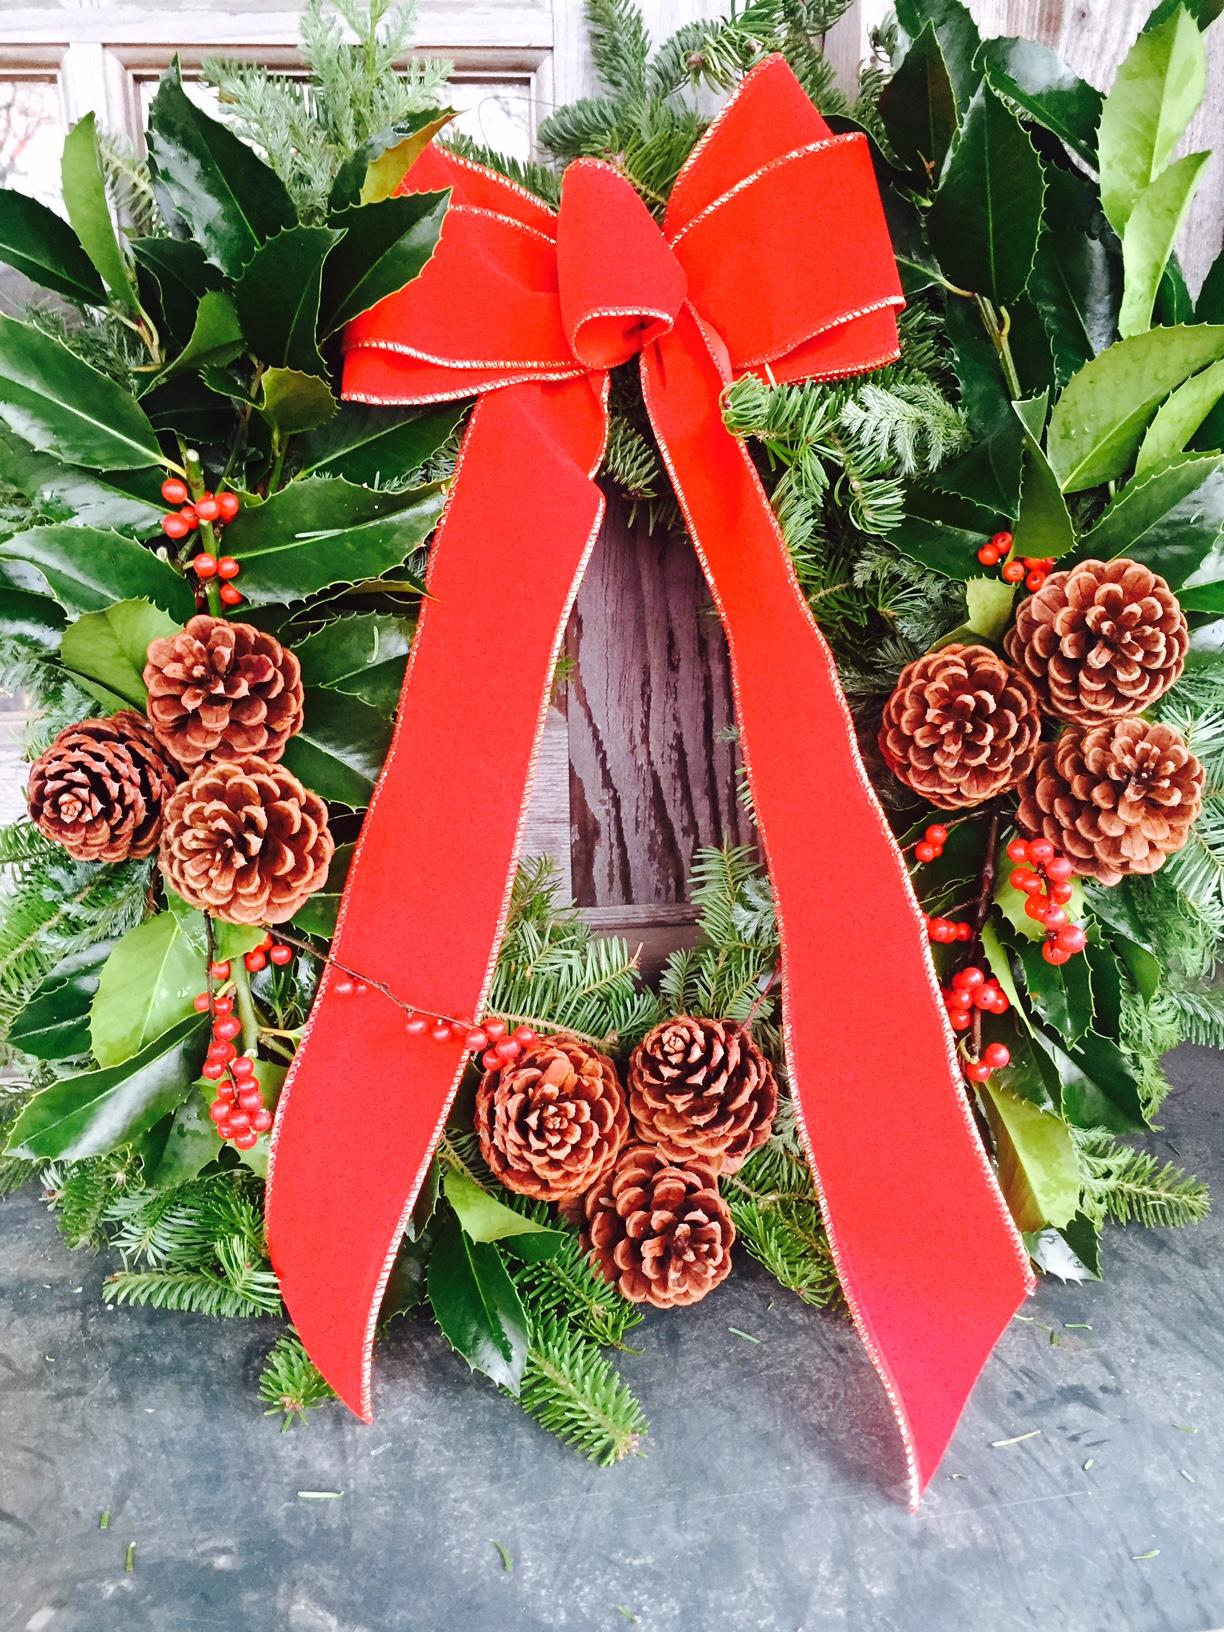 3d_wreaths_1wk.JPG